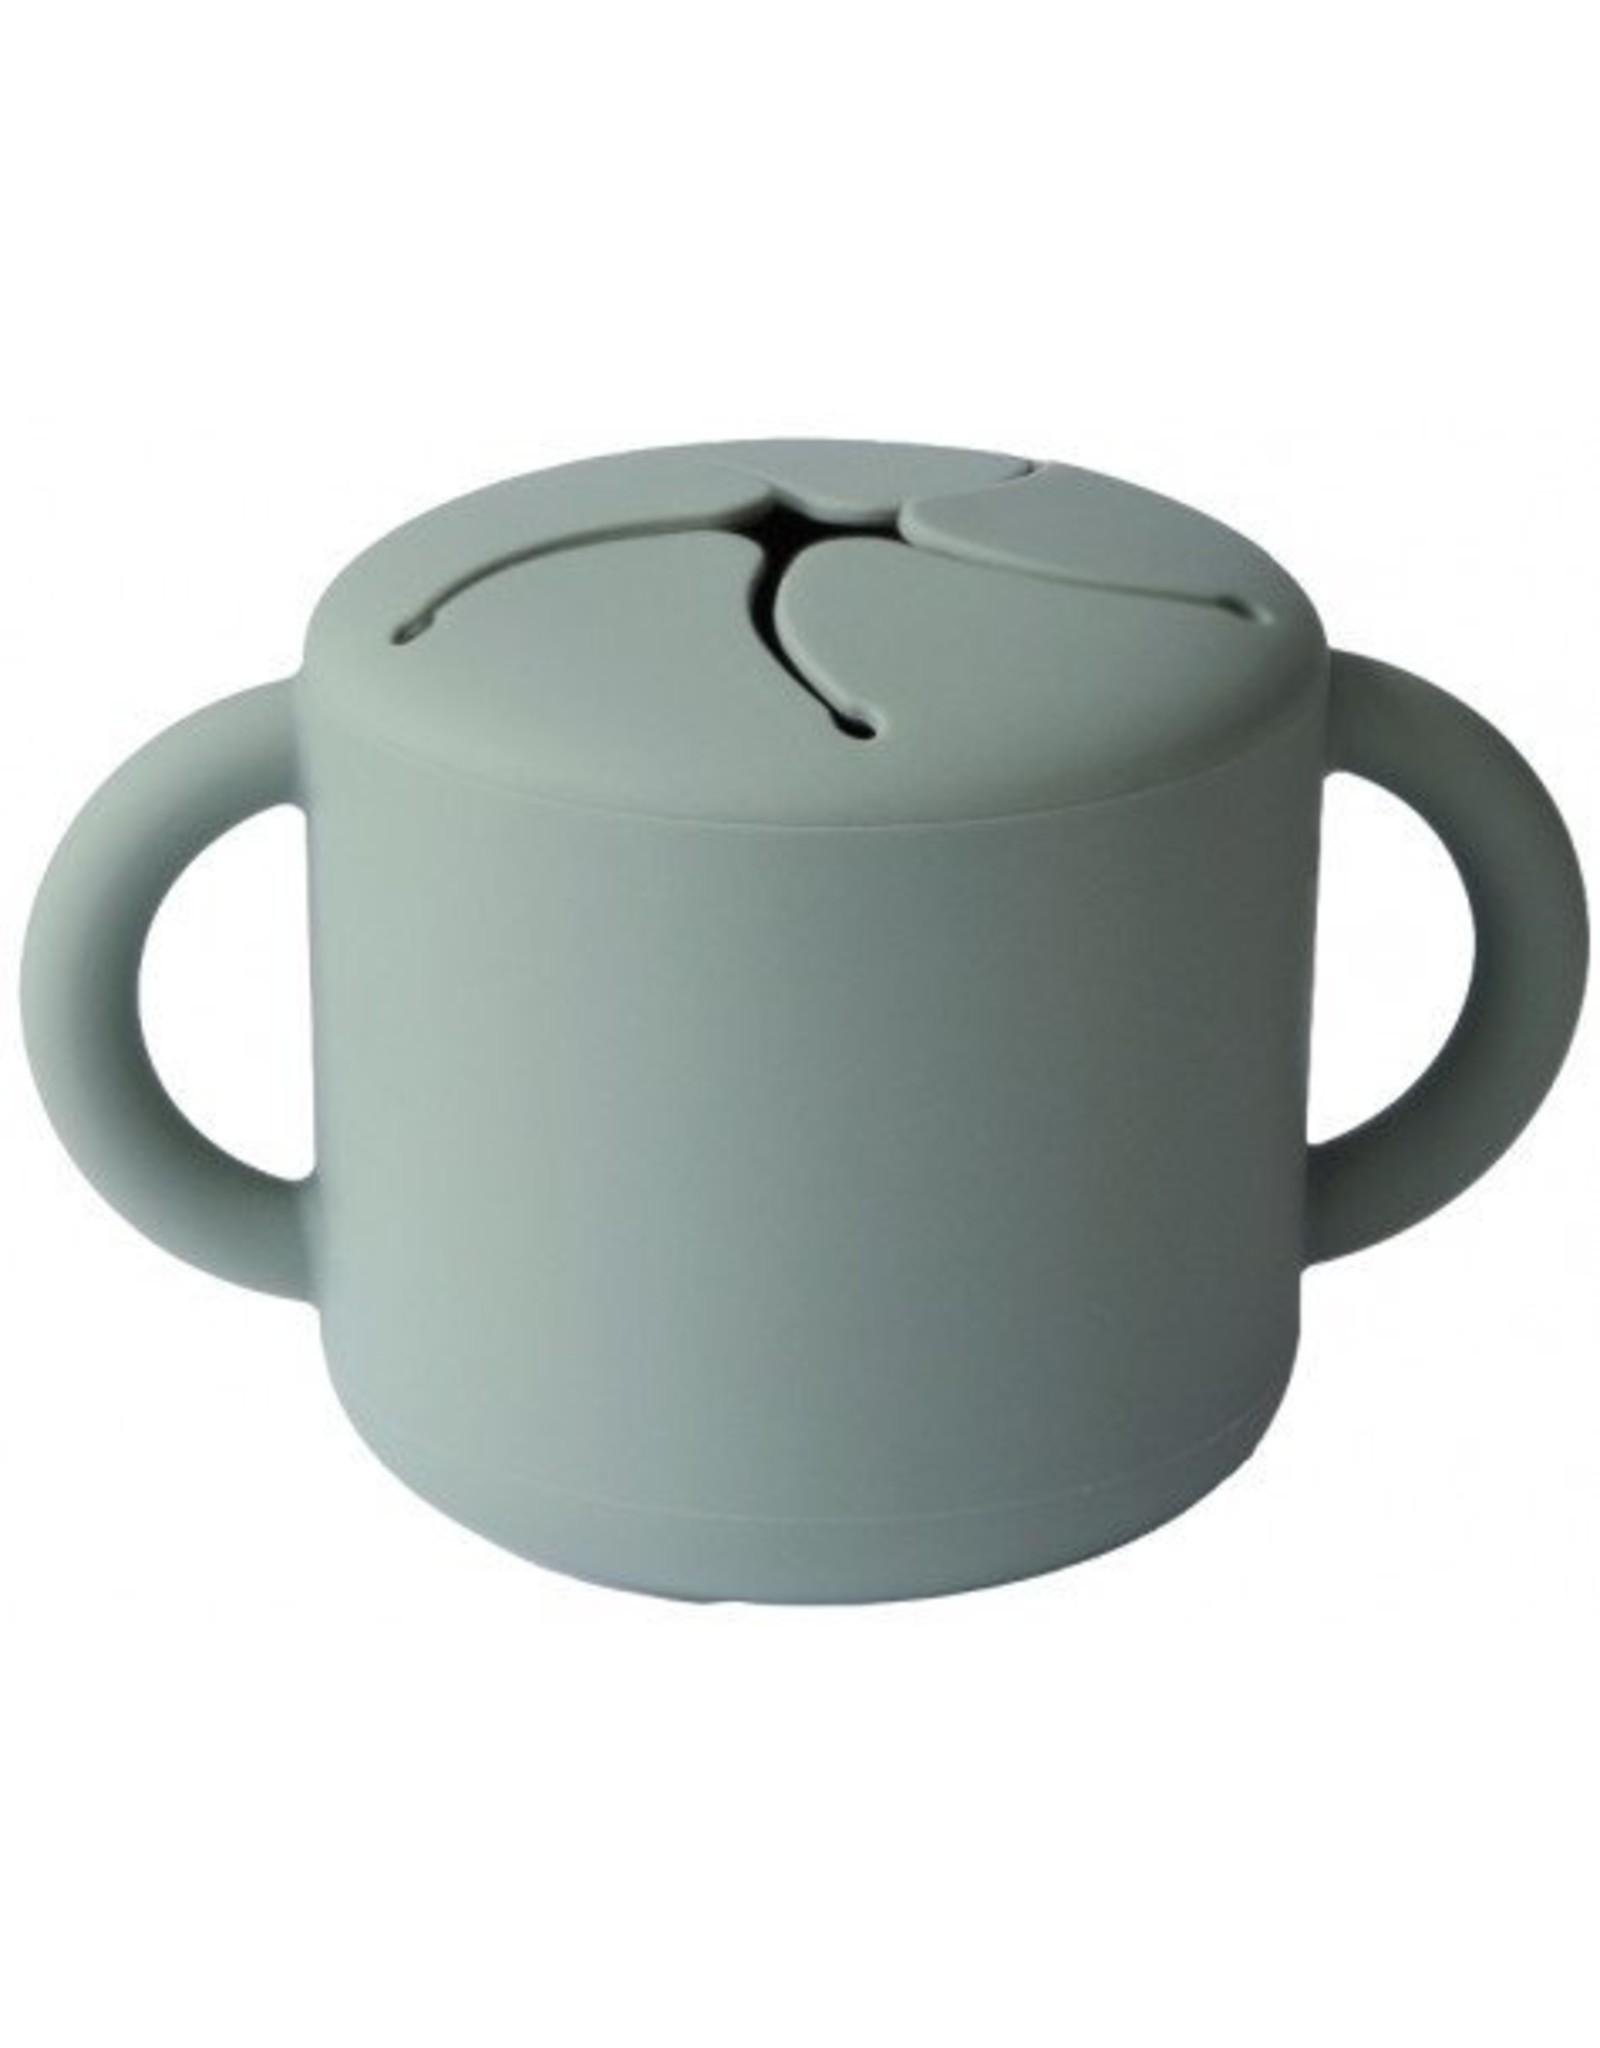 Mushie Cambridge Blue Siliconen Snack Cup